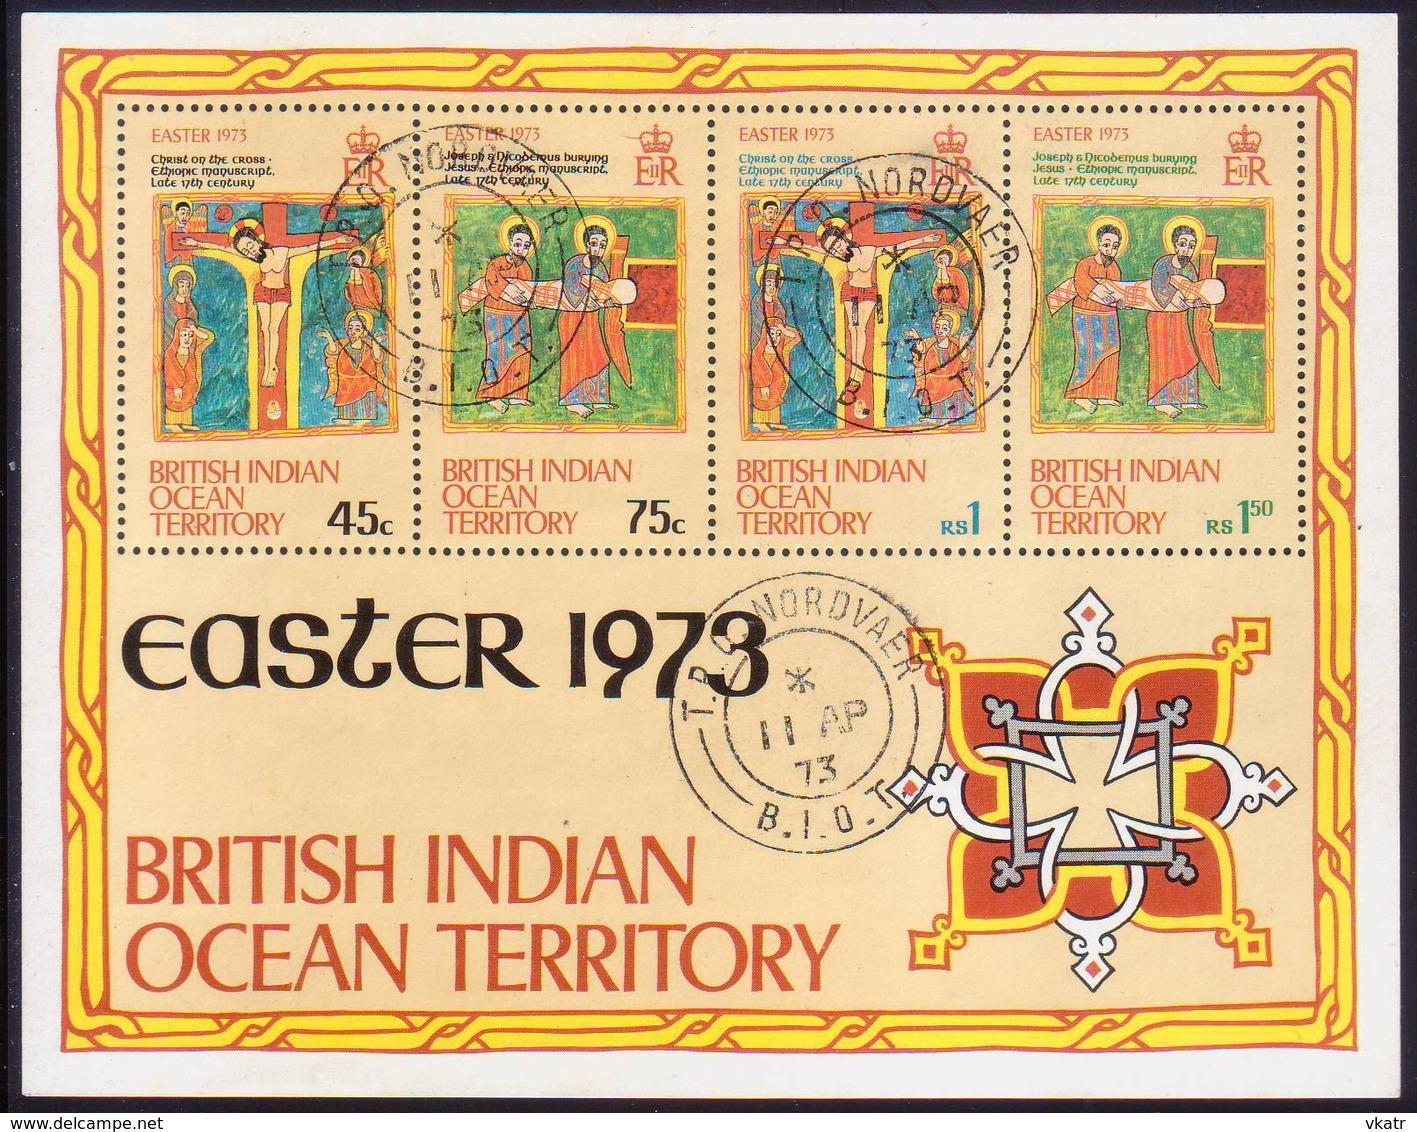 British Indian Ocean Territory 1973 SG #47-51 Compl.set+m/s Used Easter - British Indian Ocean Territory (BIOT)